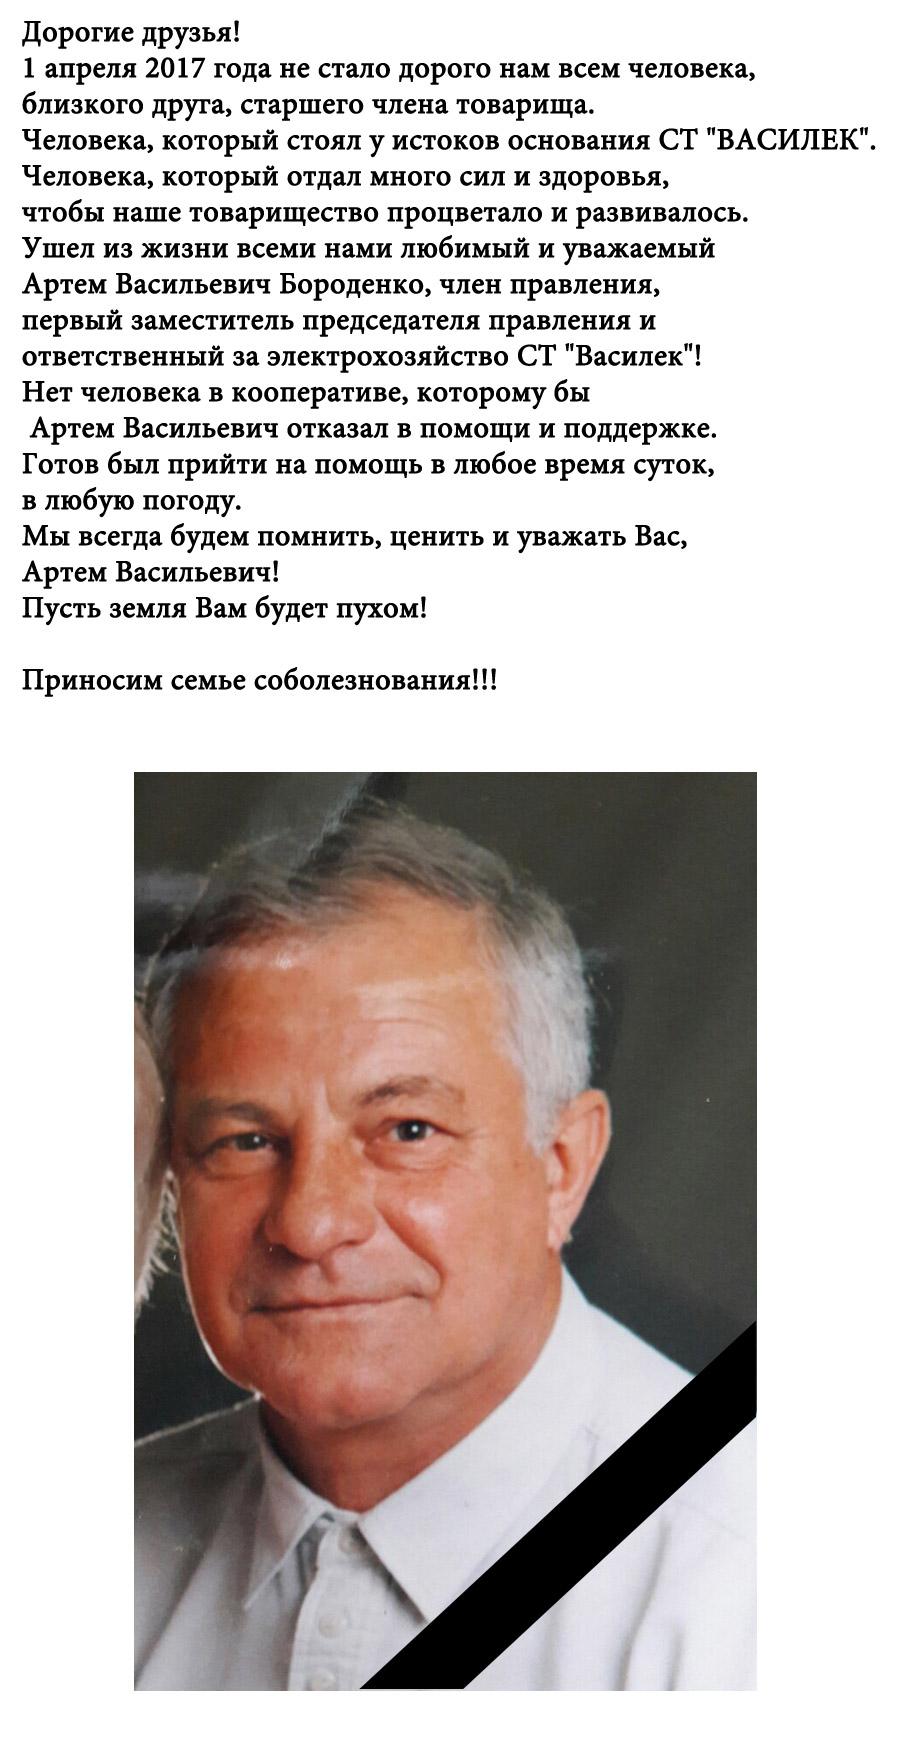 Артем Васильевич Бороденко